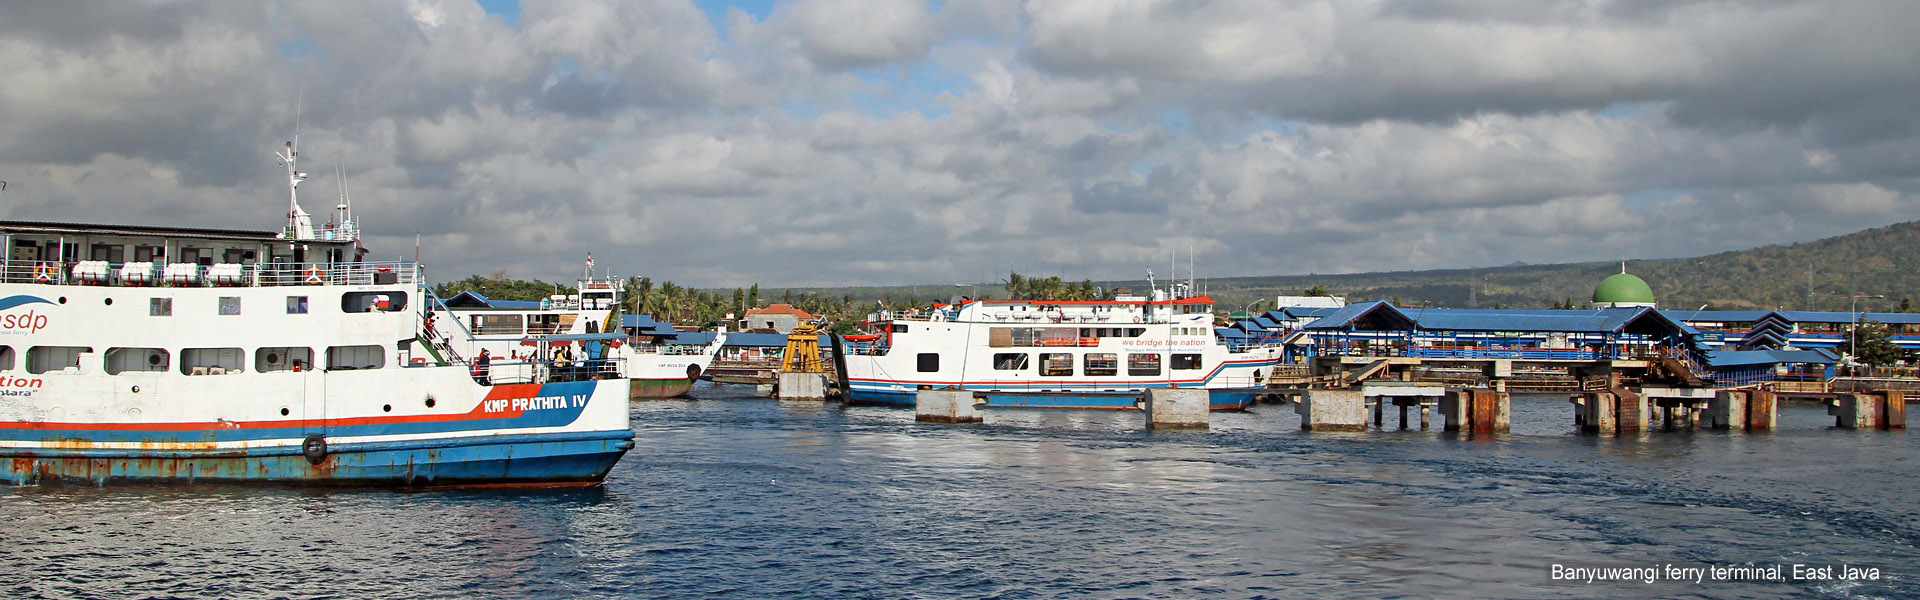 Banyuwangi ferry terminal, East Java